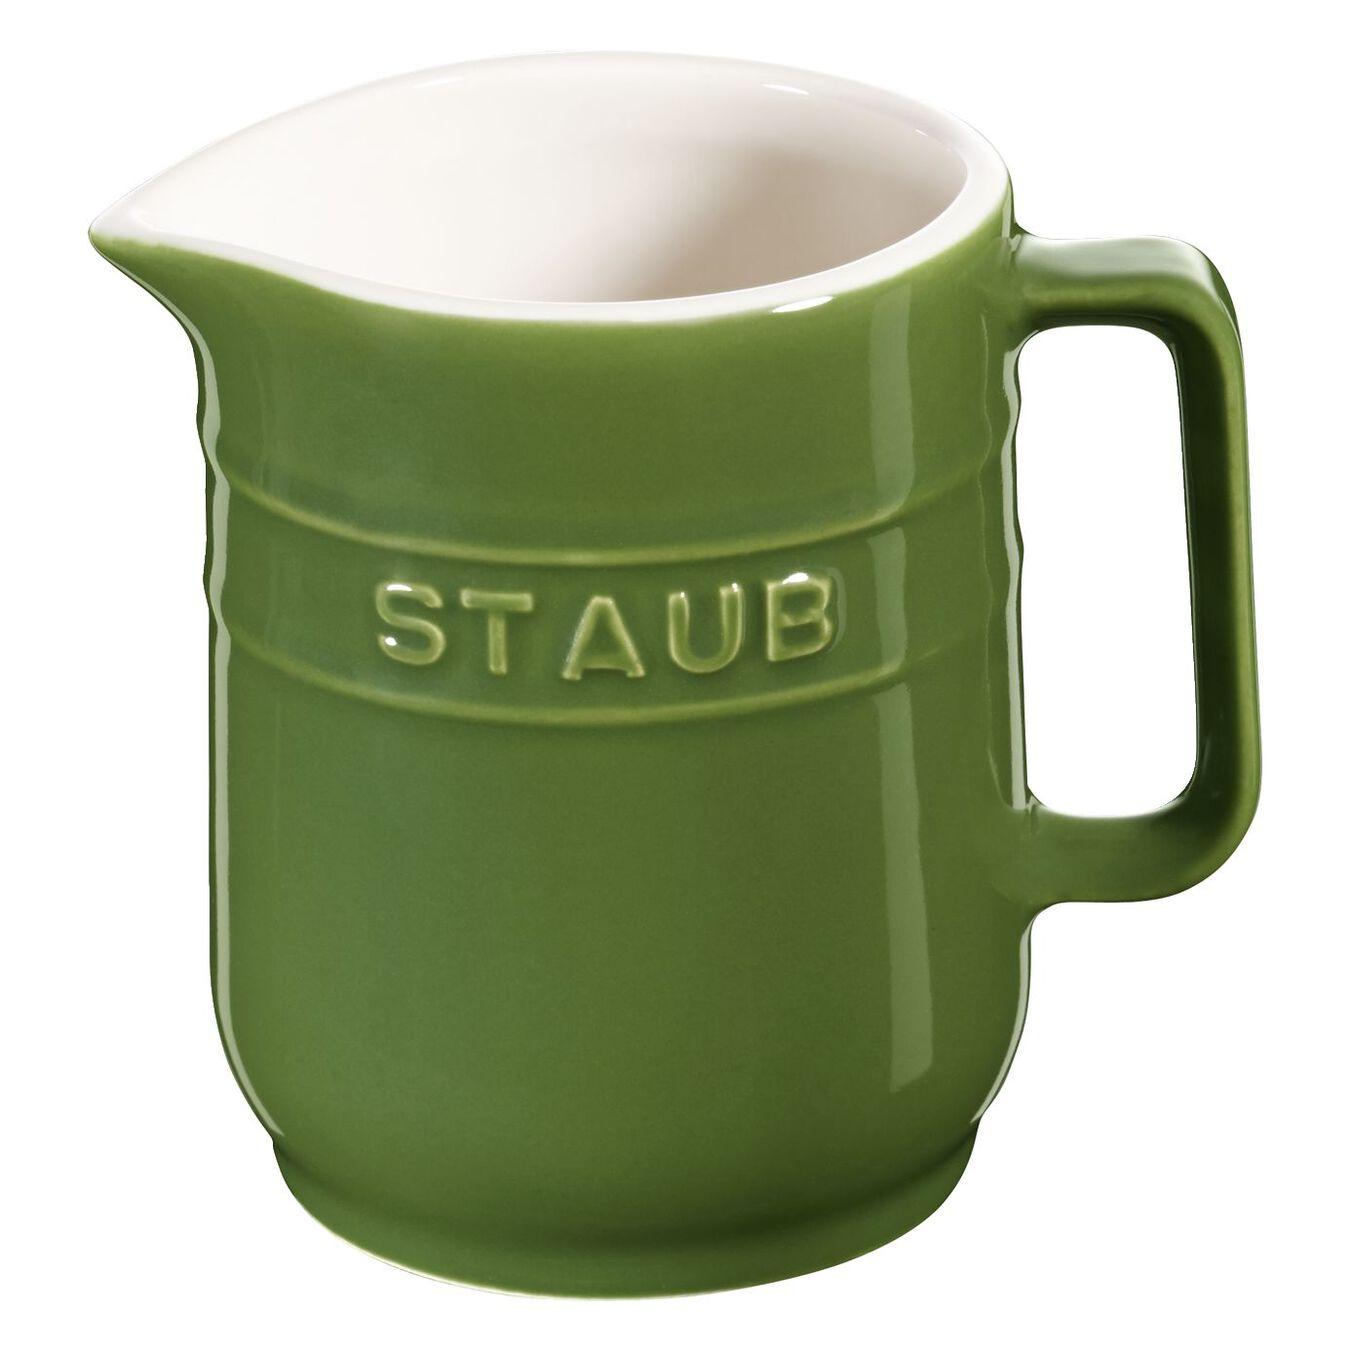 Mini Krug 250 ml, Keramik,,large 1